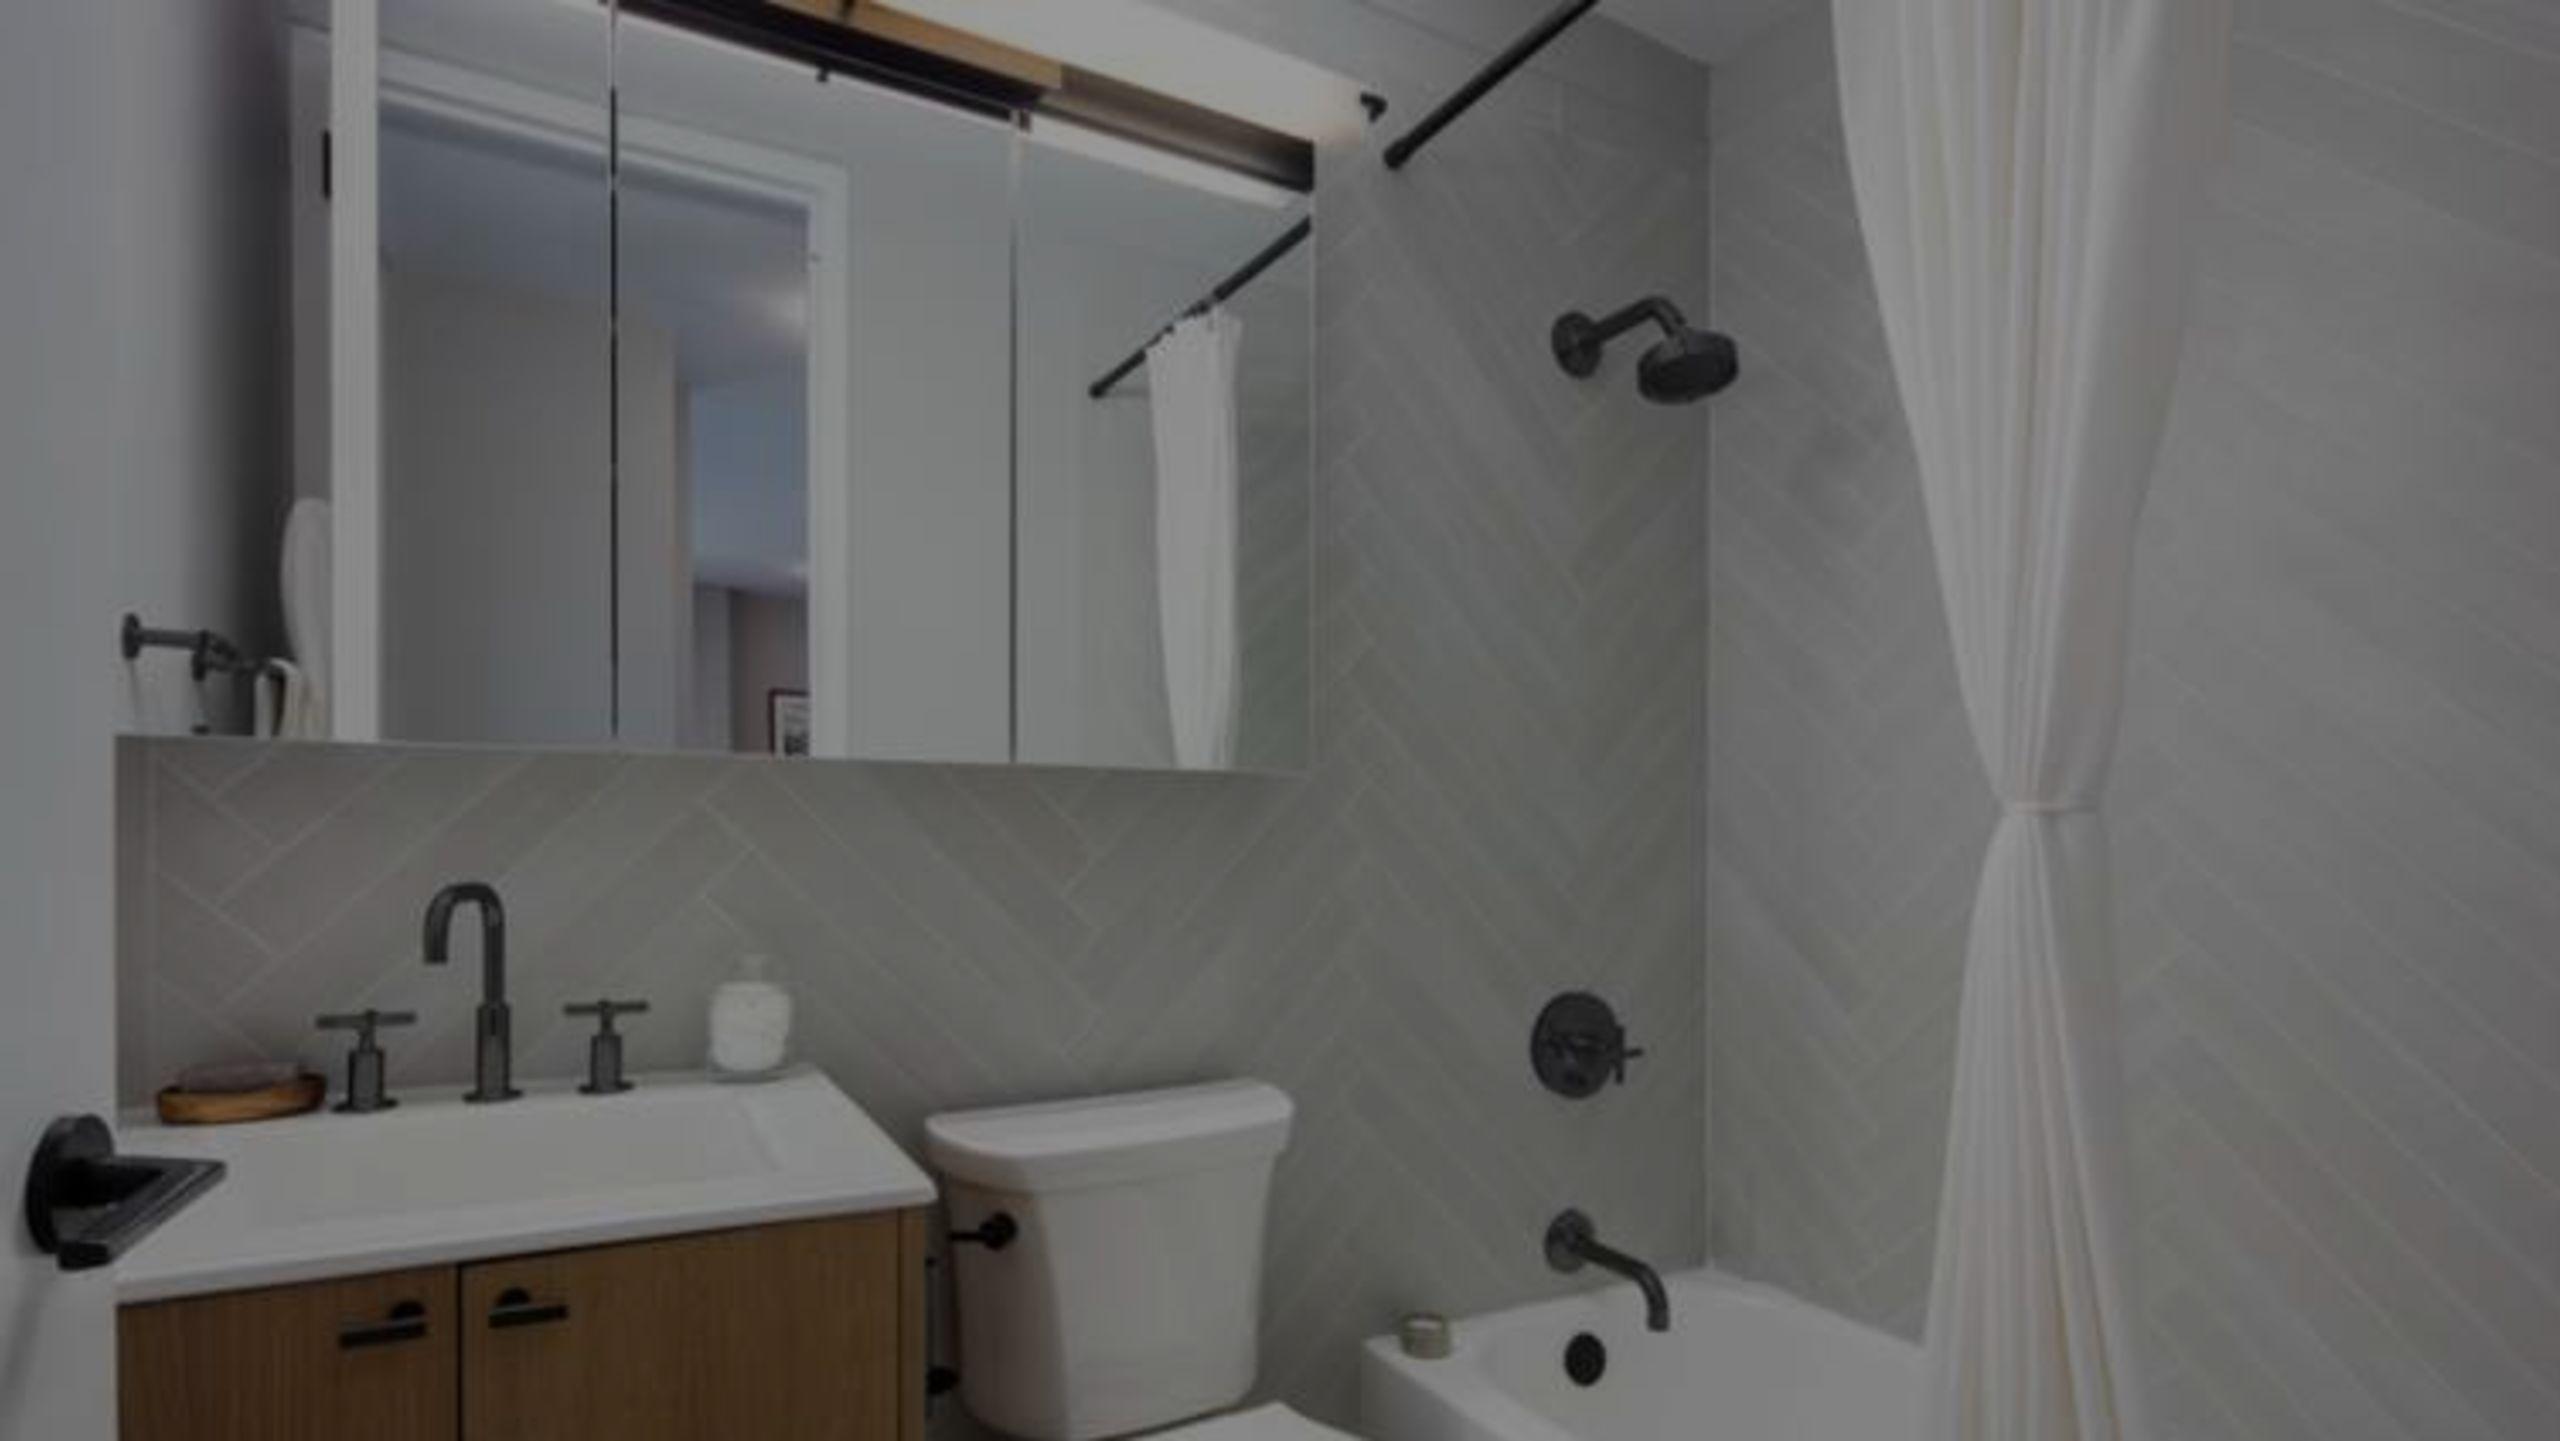 The $100 Bathroom Makeover